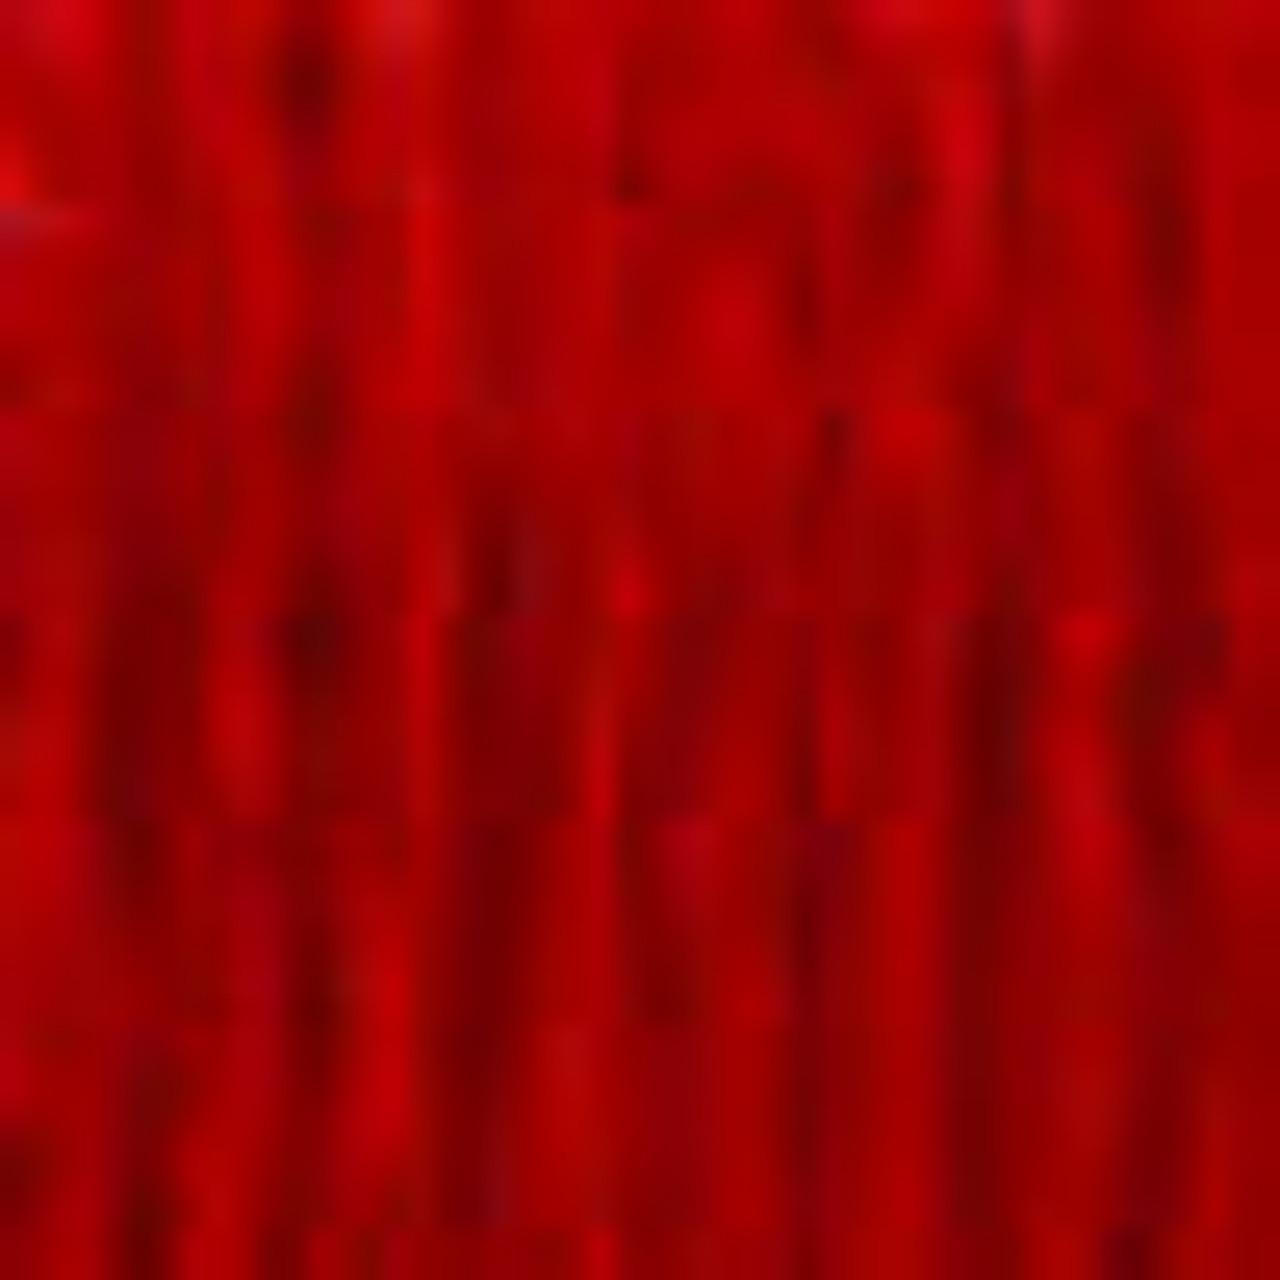 DMC # 3777 Very Dark Terra Cotta Floss / Thread